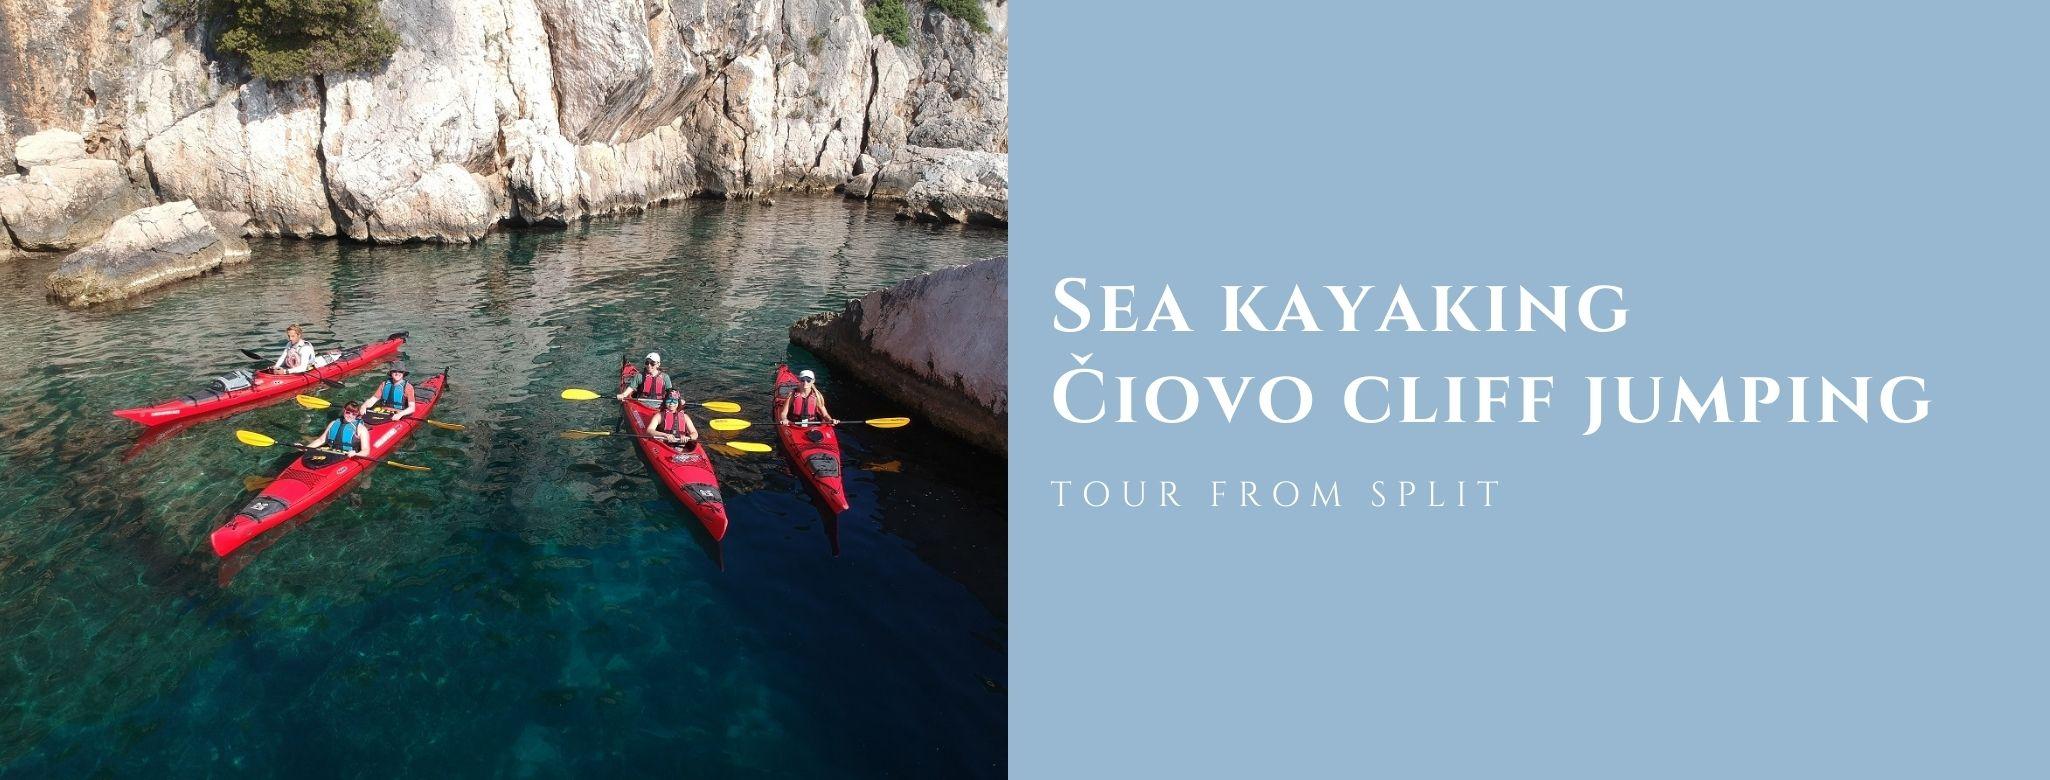 Sea kayak čiovo cliff jumping